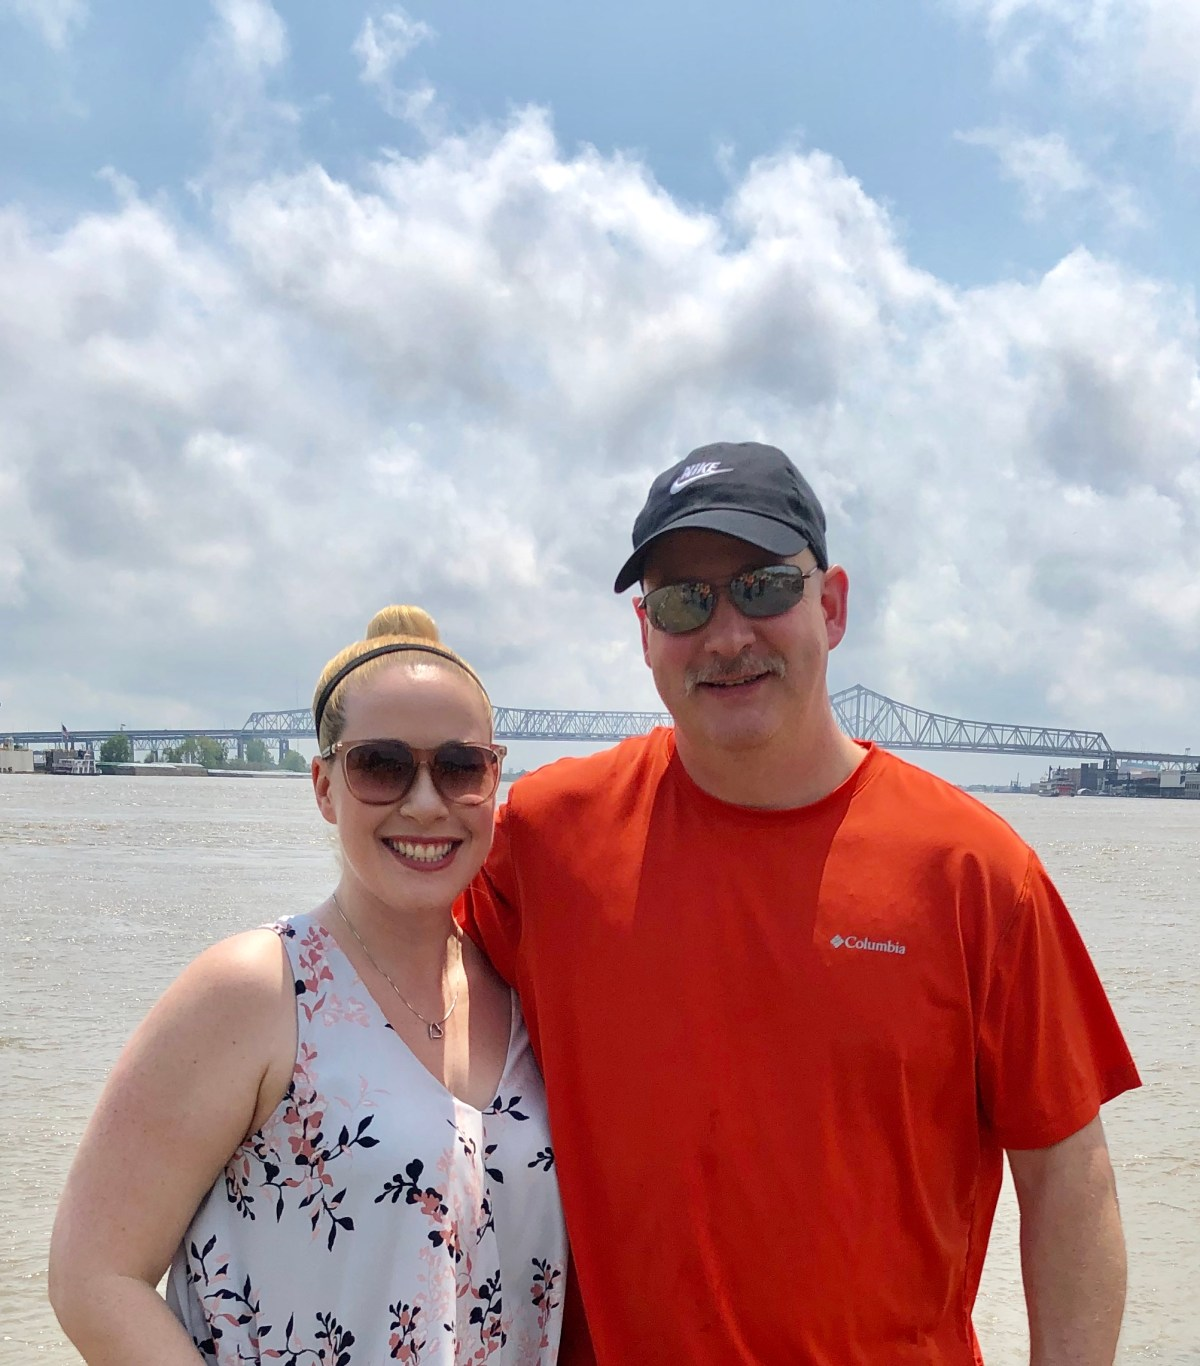 Mississippi River, New Orleans #neworleansoutfits #mississippiriver #neworleans #nola #whattowearinnola #howtodressinneworleans #neworleanspackinglist #neworleansattire